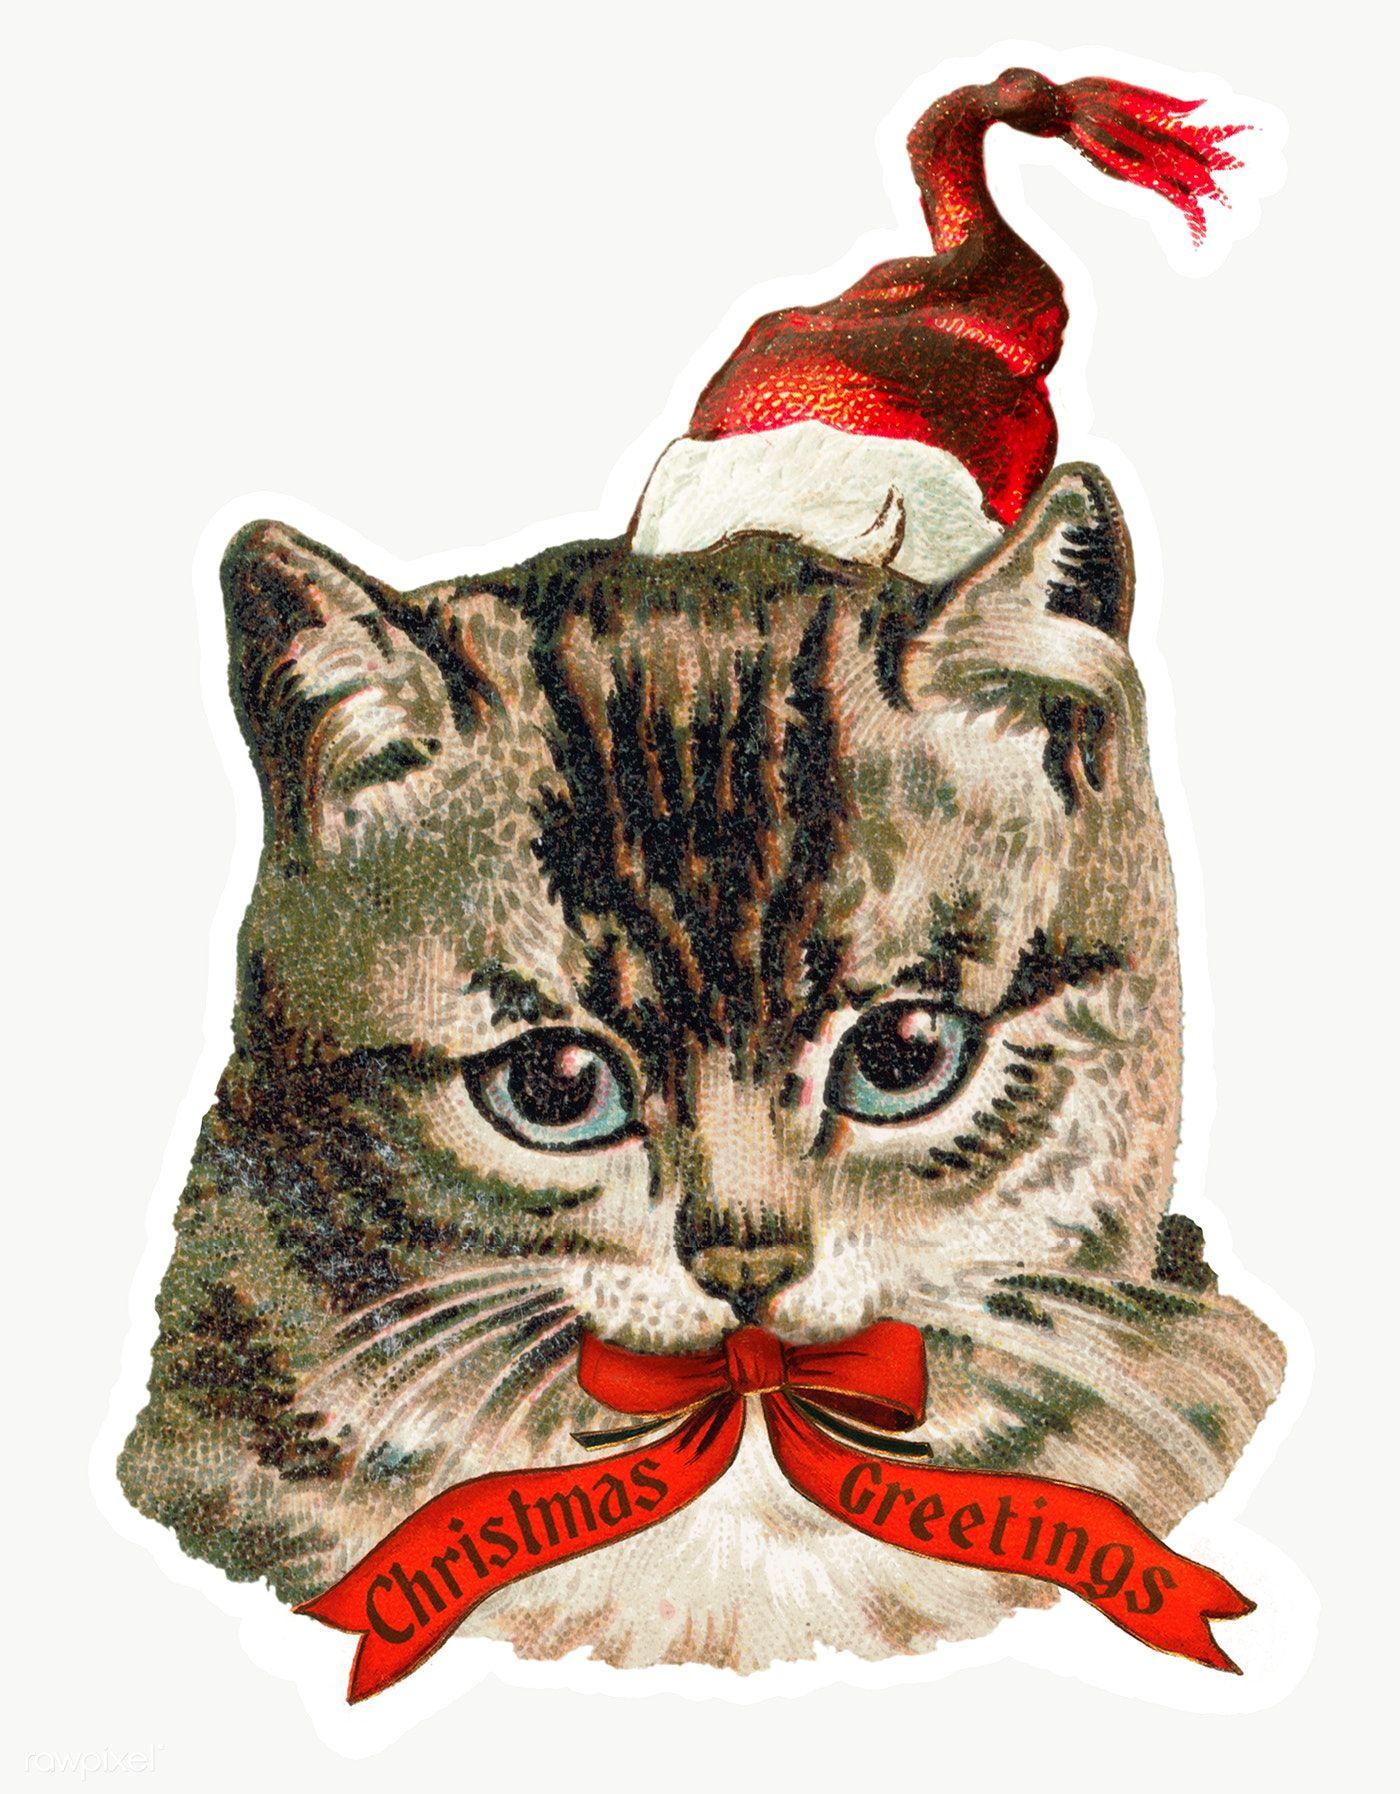 Download premium png of Cat wearing a Santa hat sticker